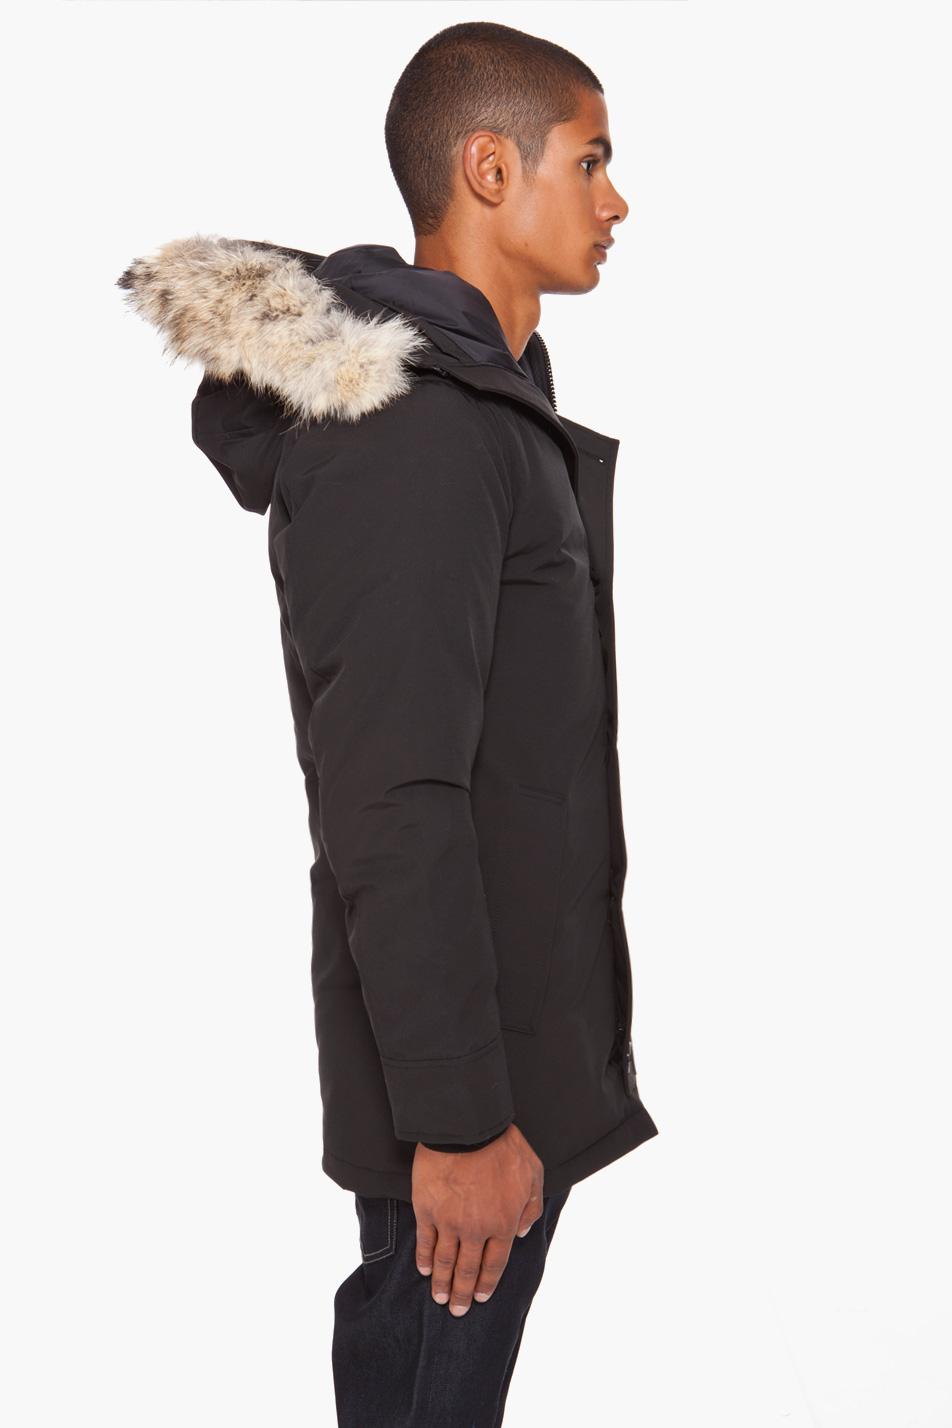 canada goose chateau parka women Category: canada goose men chateau canada goose snow mantra parka canada goose jackets,canada goose jackets womens,canada goose jackets for sale,buy.